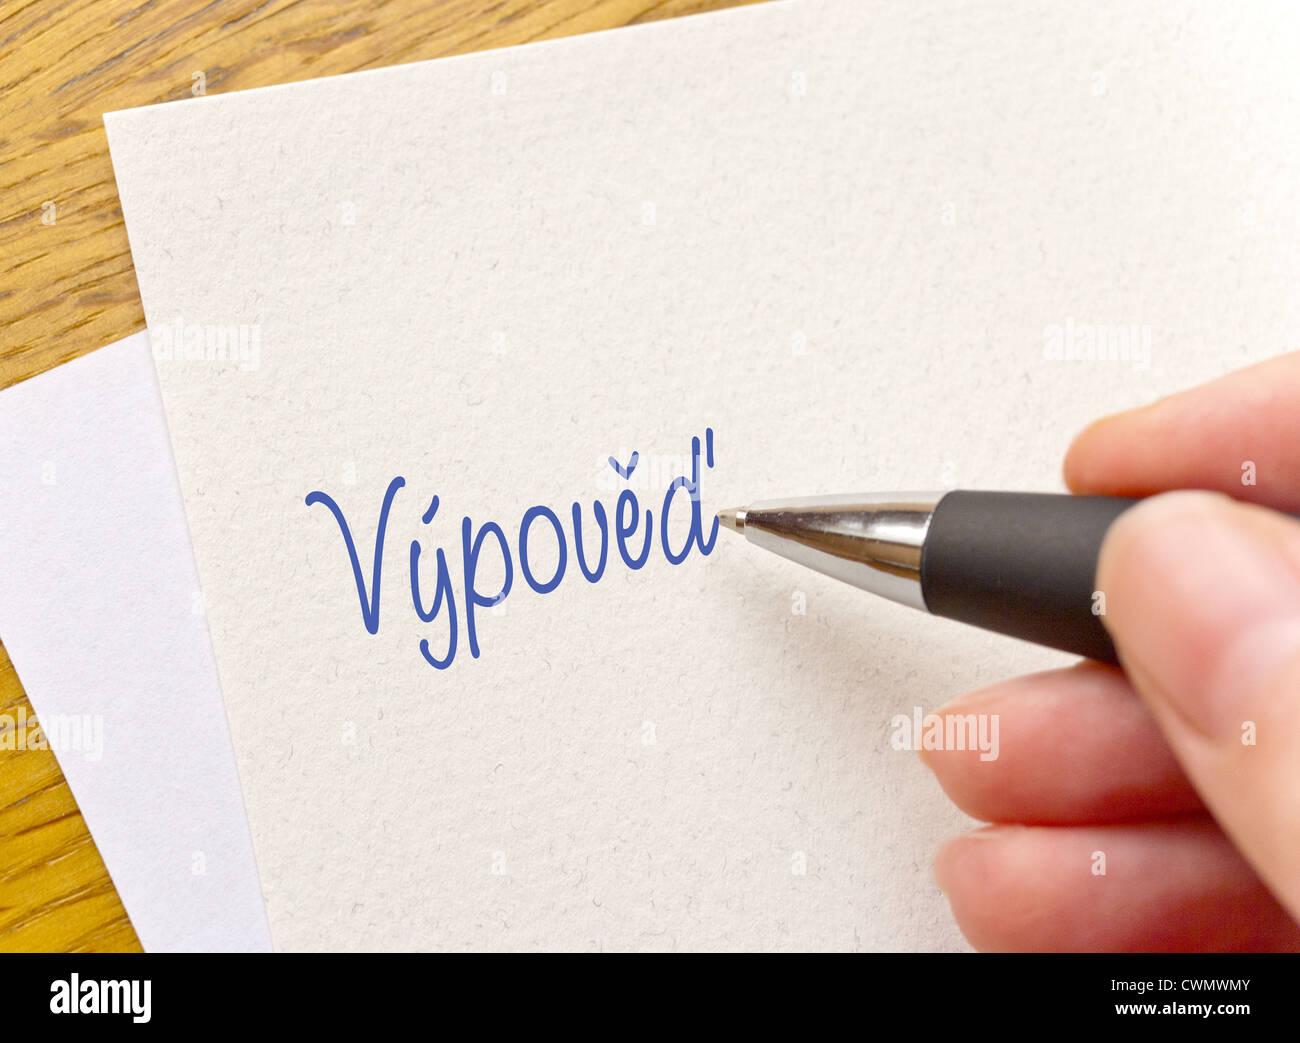 Czech writting - Vypoved headline - resignation - Stock Image